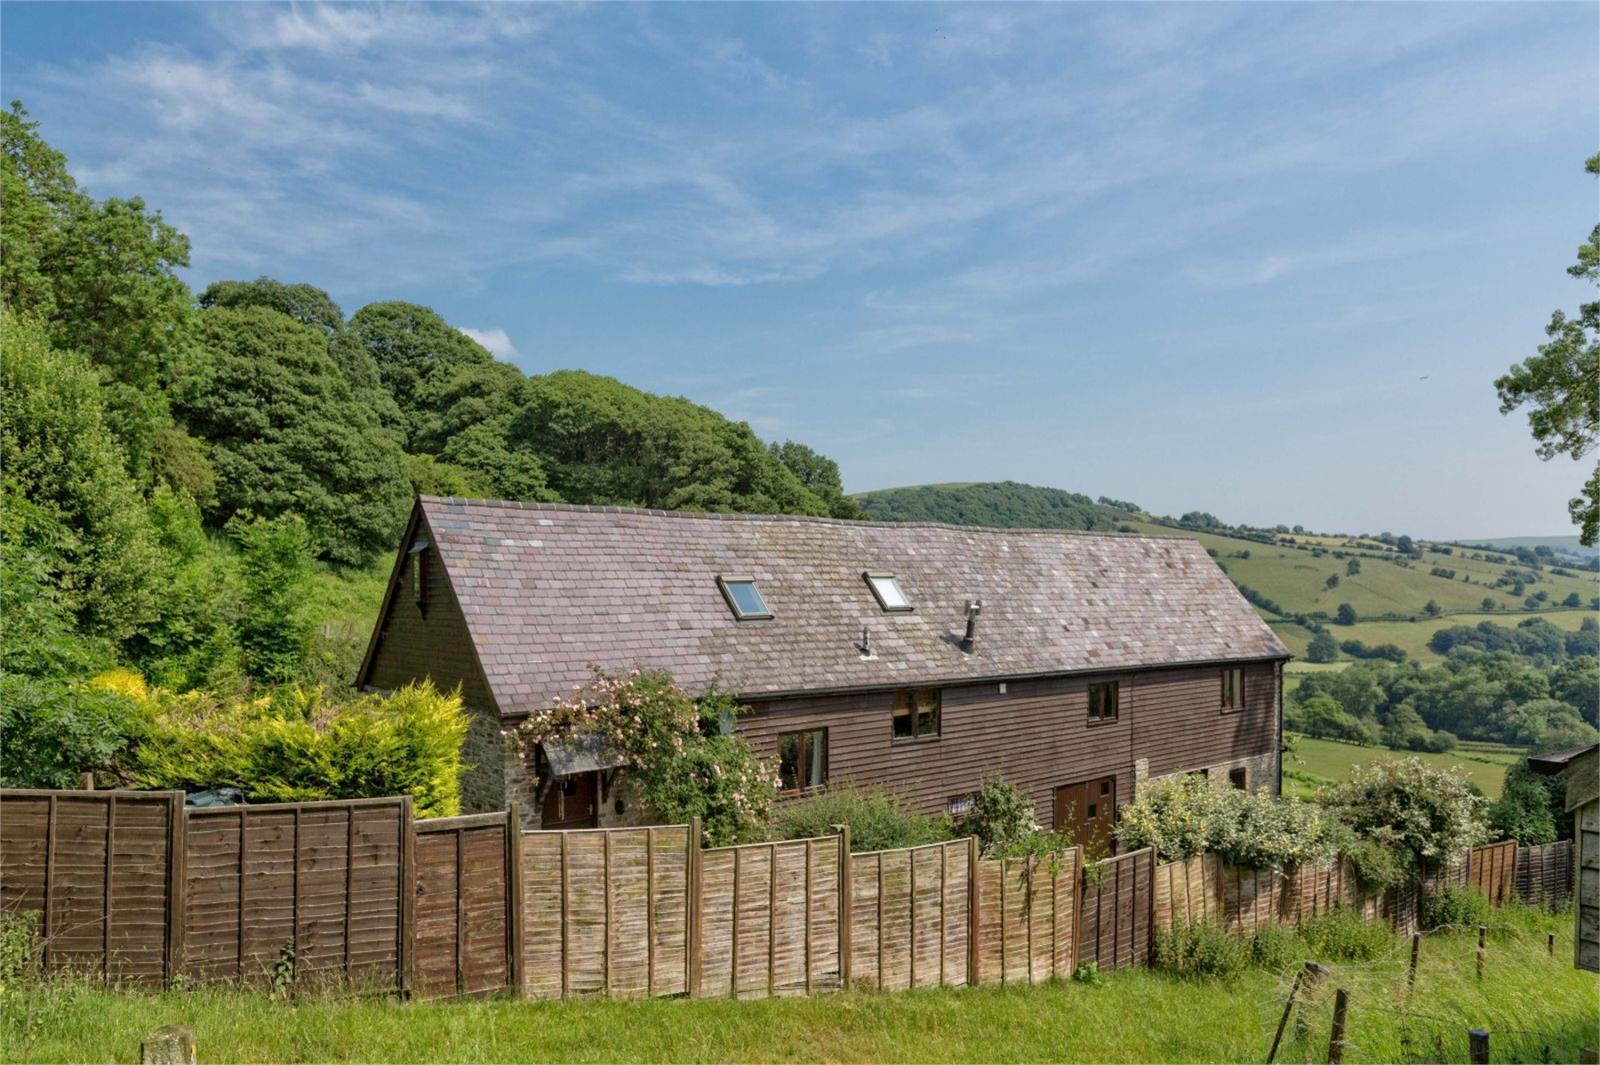 5 Bedrooms Barn Conversion Character Property for sale in Tyn-Y-Cefn Barn, Lloyney, Knighton, Powys, LD7